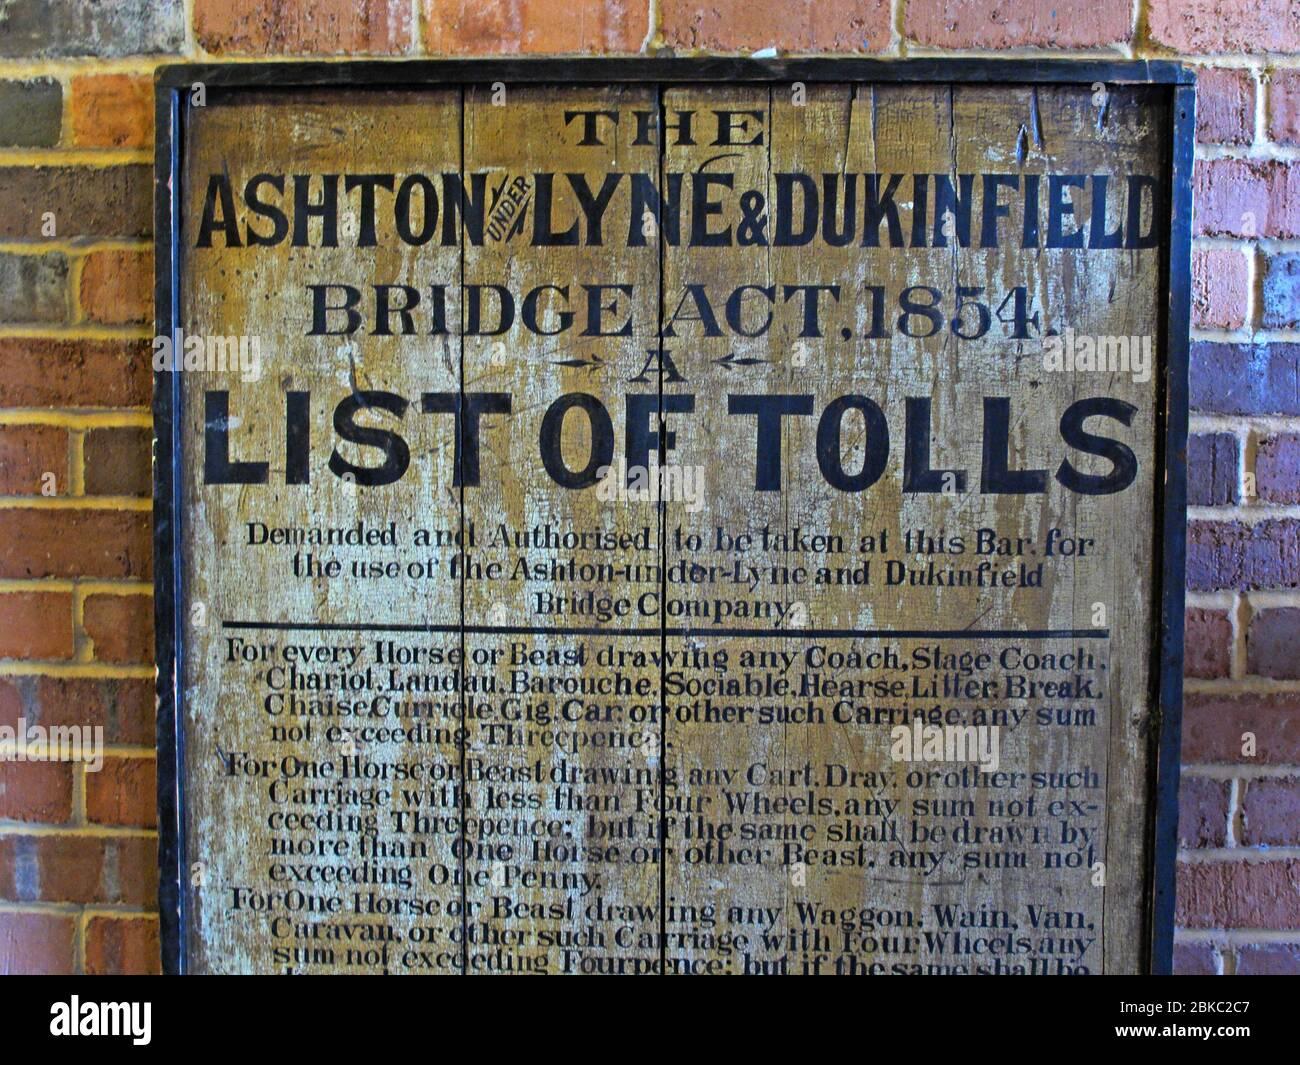 HotpixUK,@HotpixUK,GoTonySmith,Bridge,Tollls,GMC,England,Uk